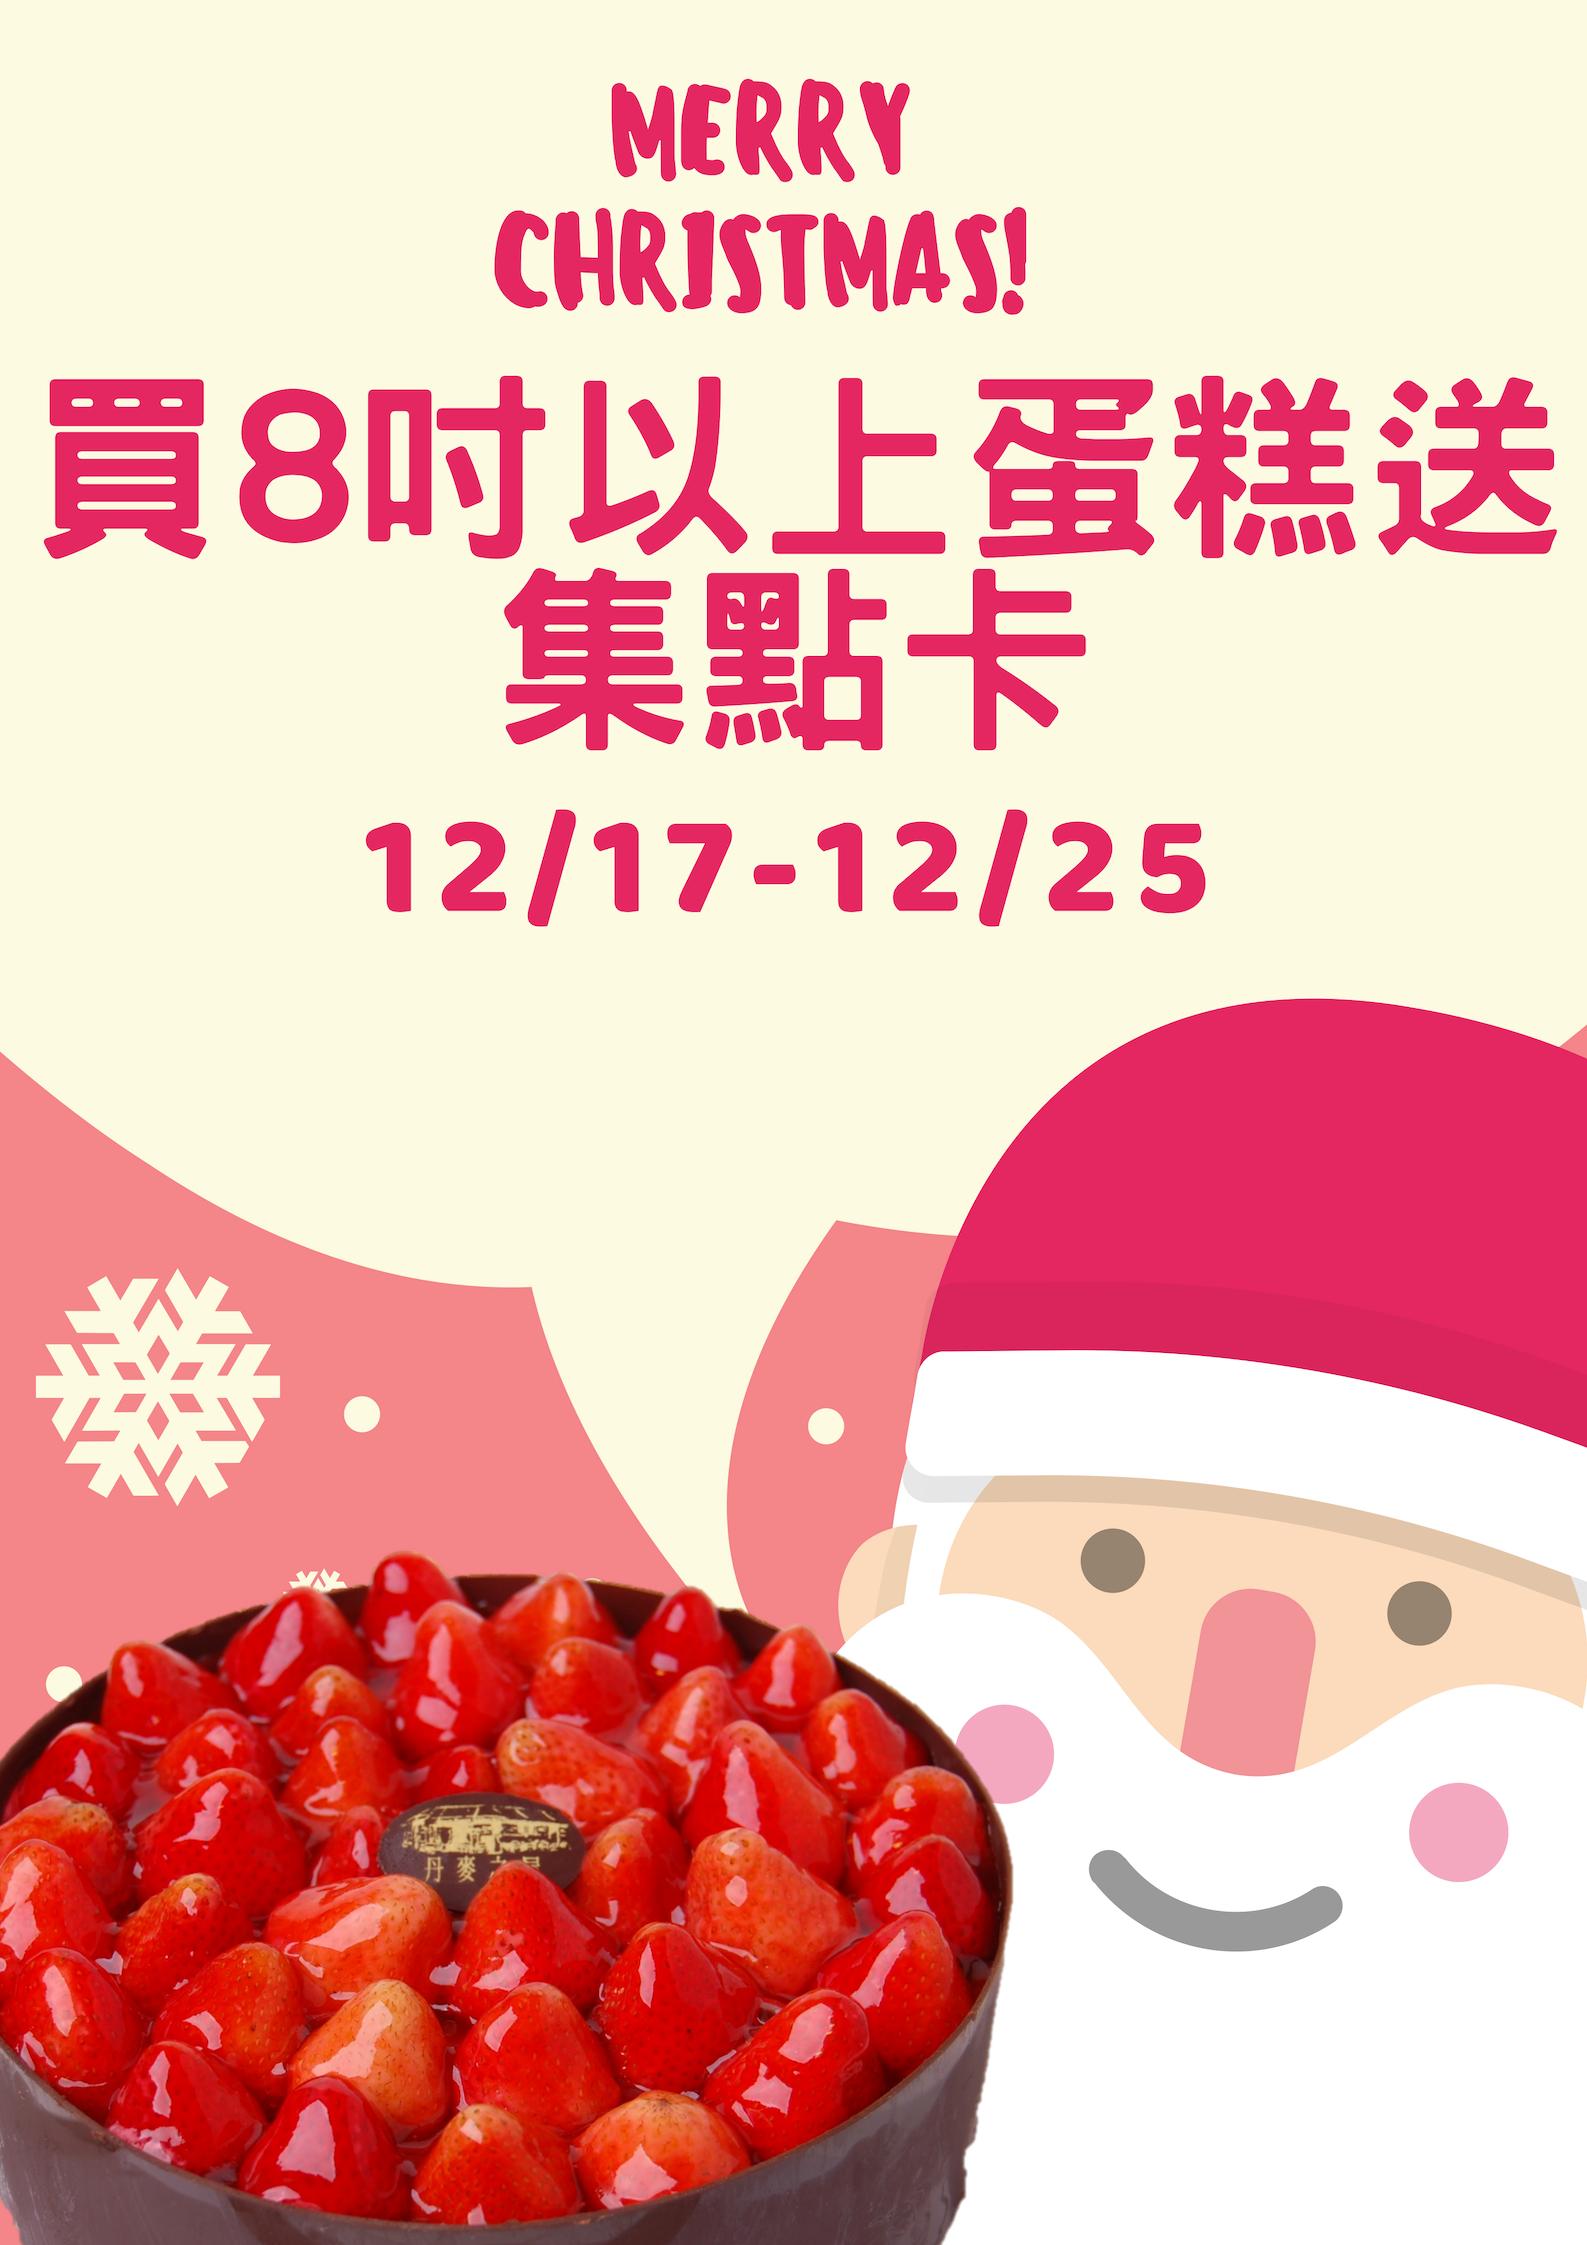 Christmas! (2).jpg